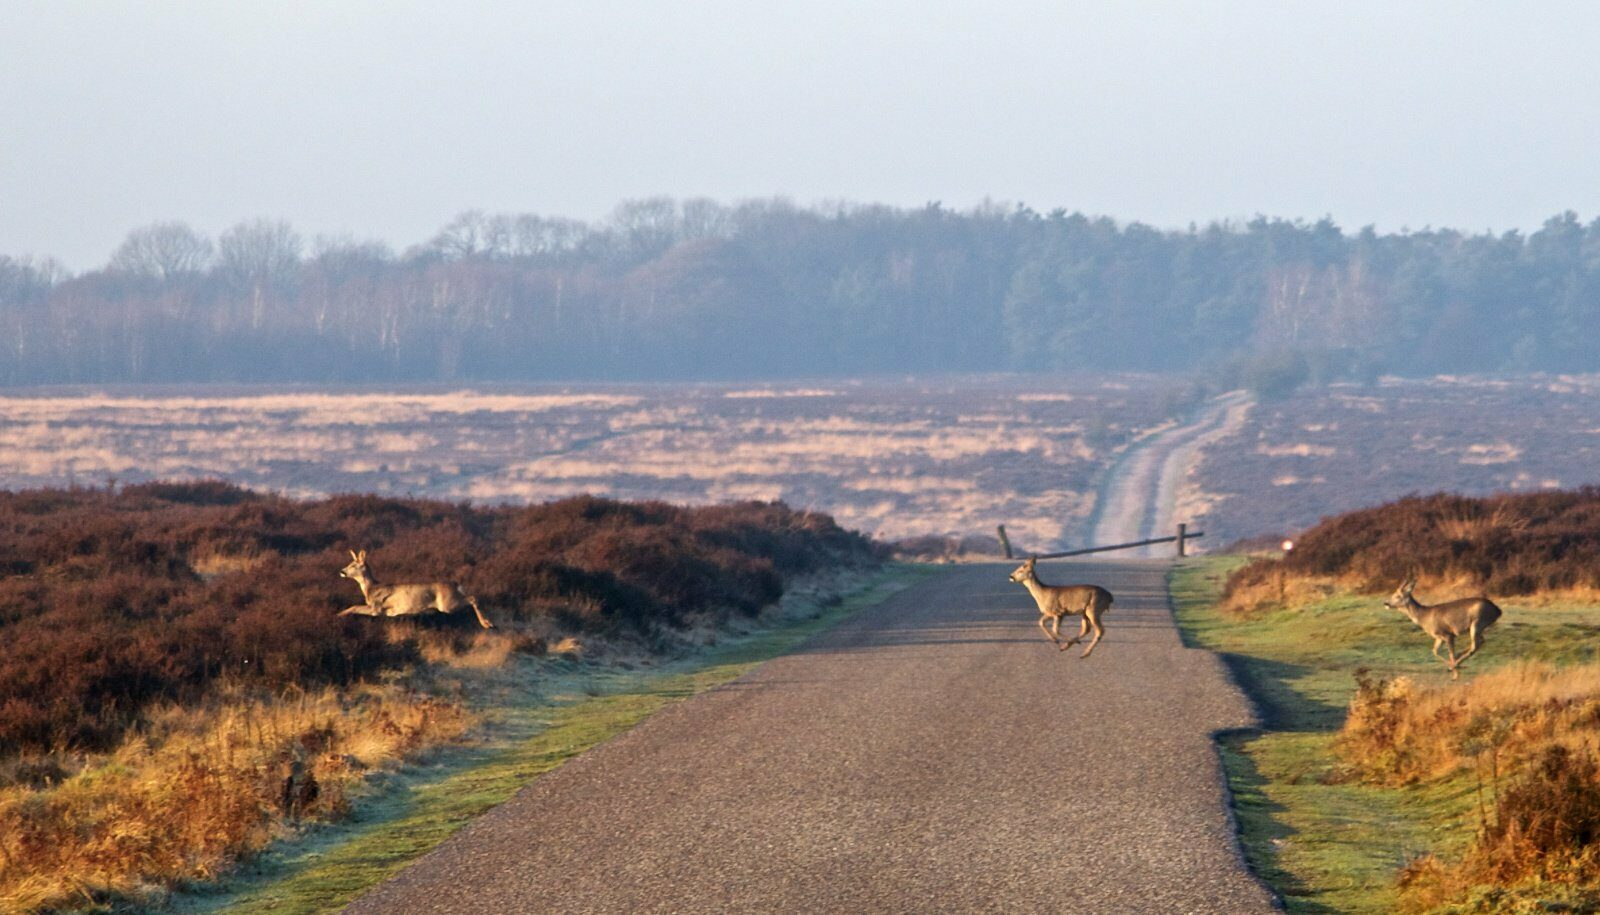 🌳 Beautiful nature at the Hoge Veluwe National Park